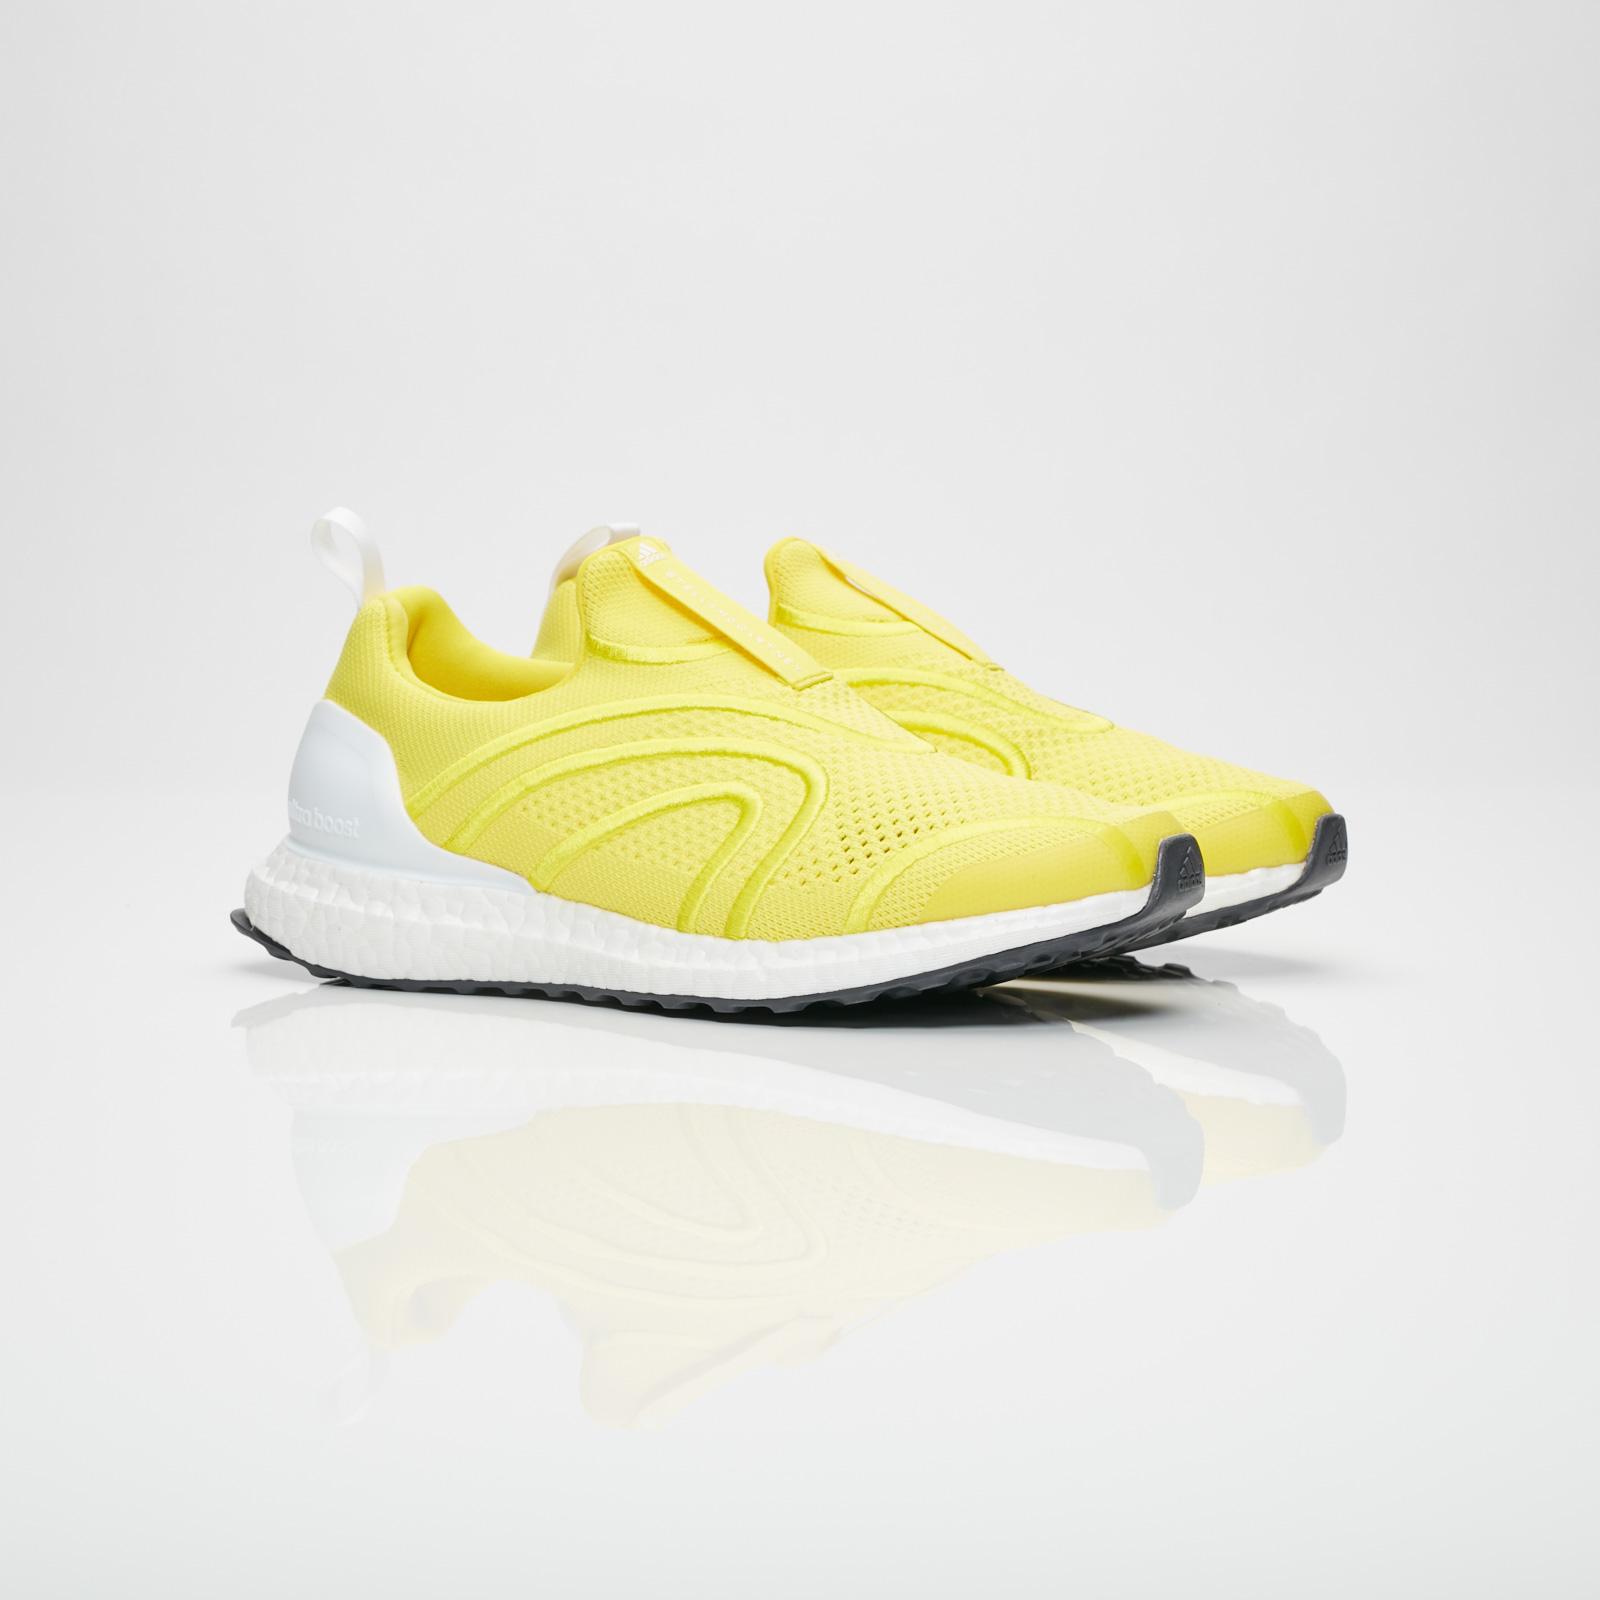 4063bcf96 adidas UltraBOOST Uncaged - Bb6272 - Sneakersnstuff